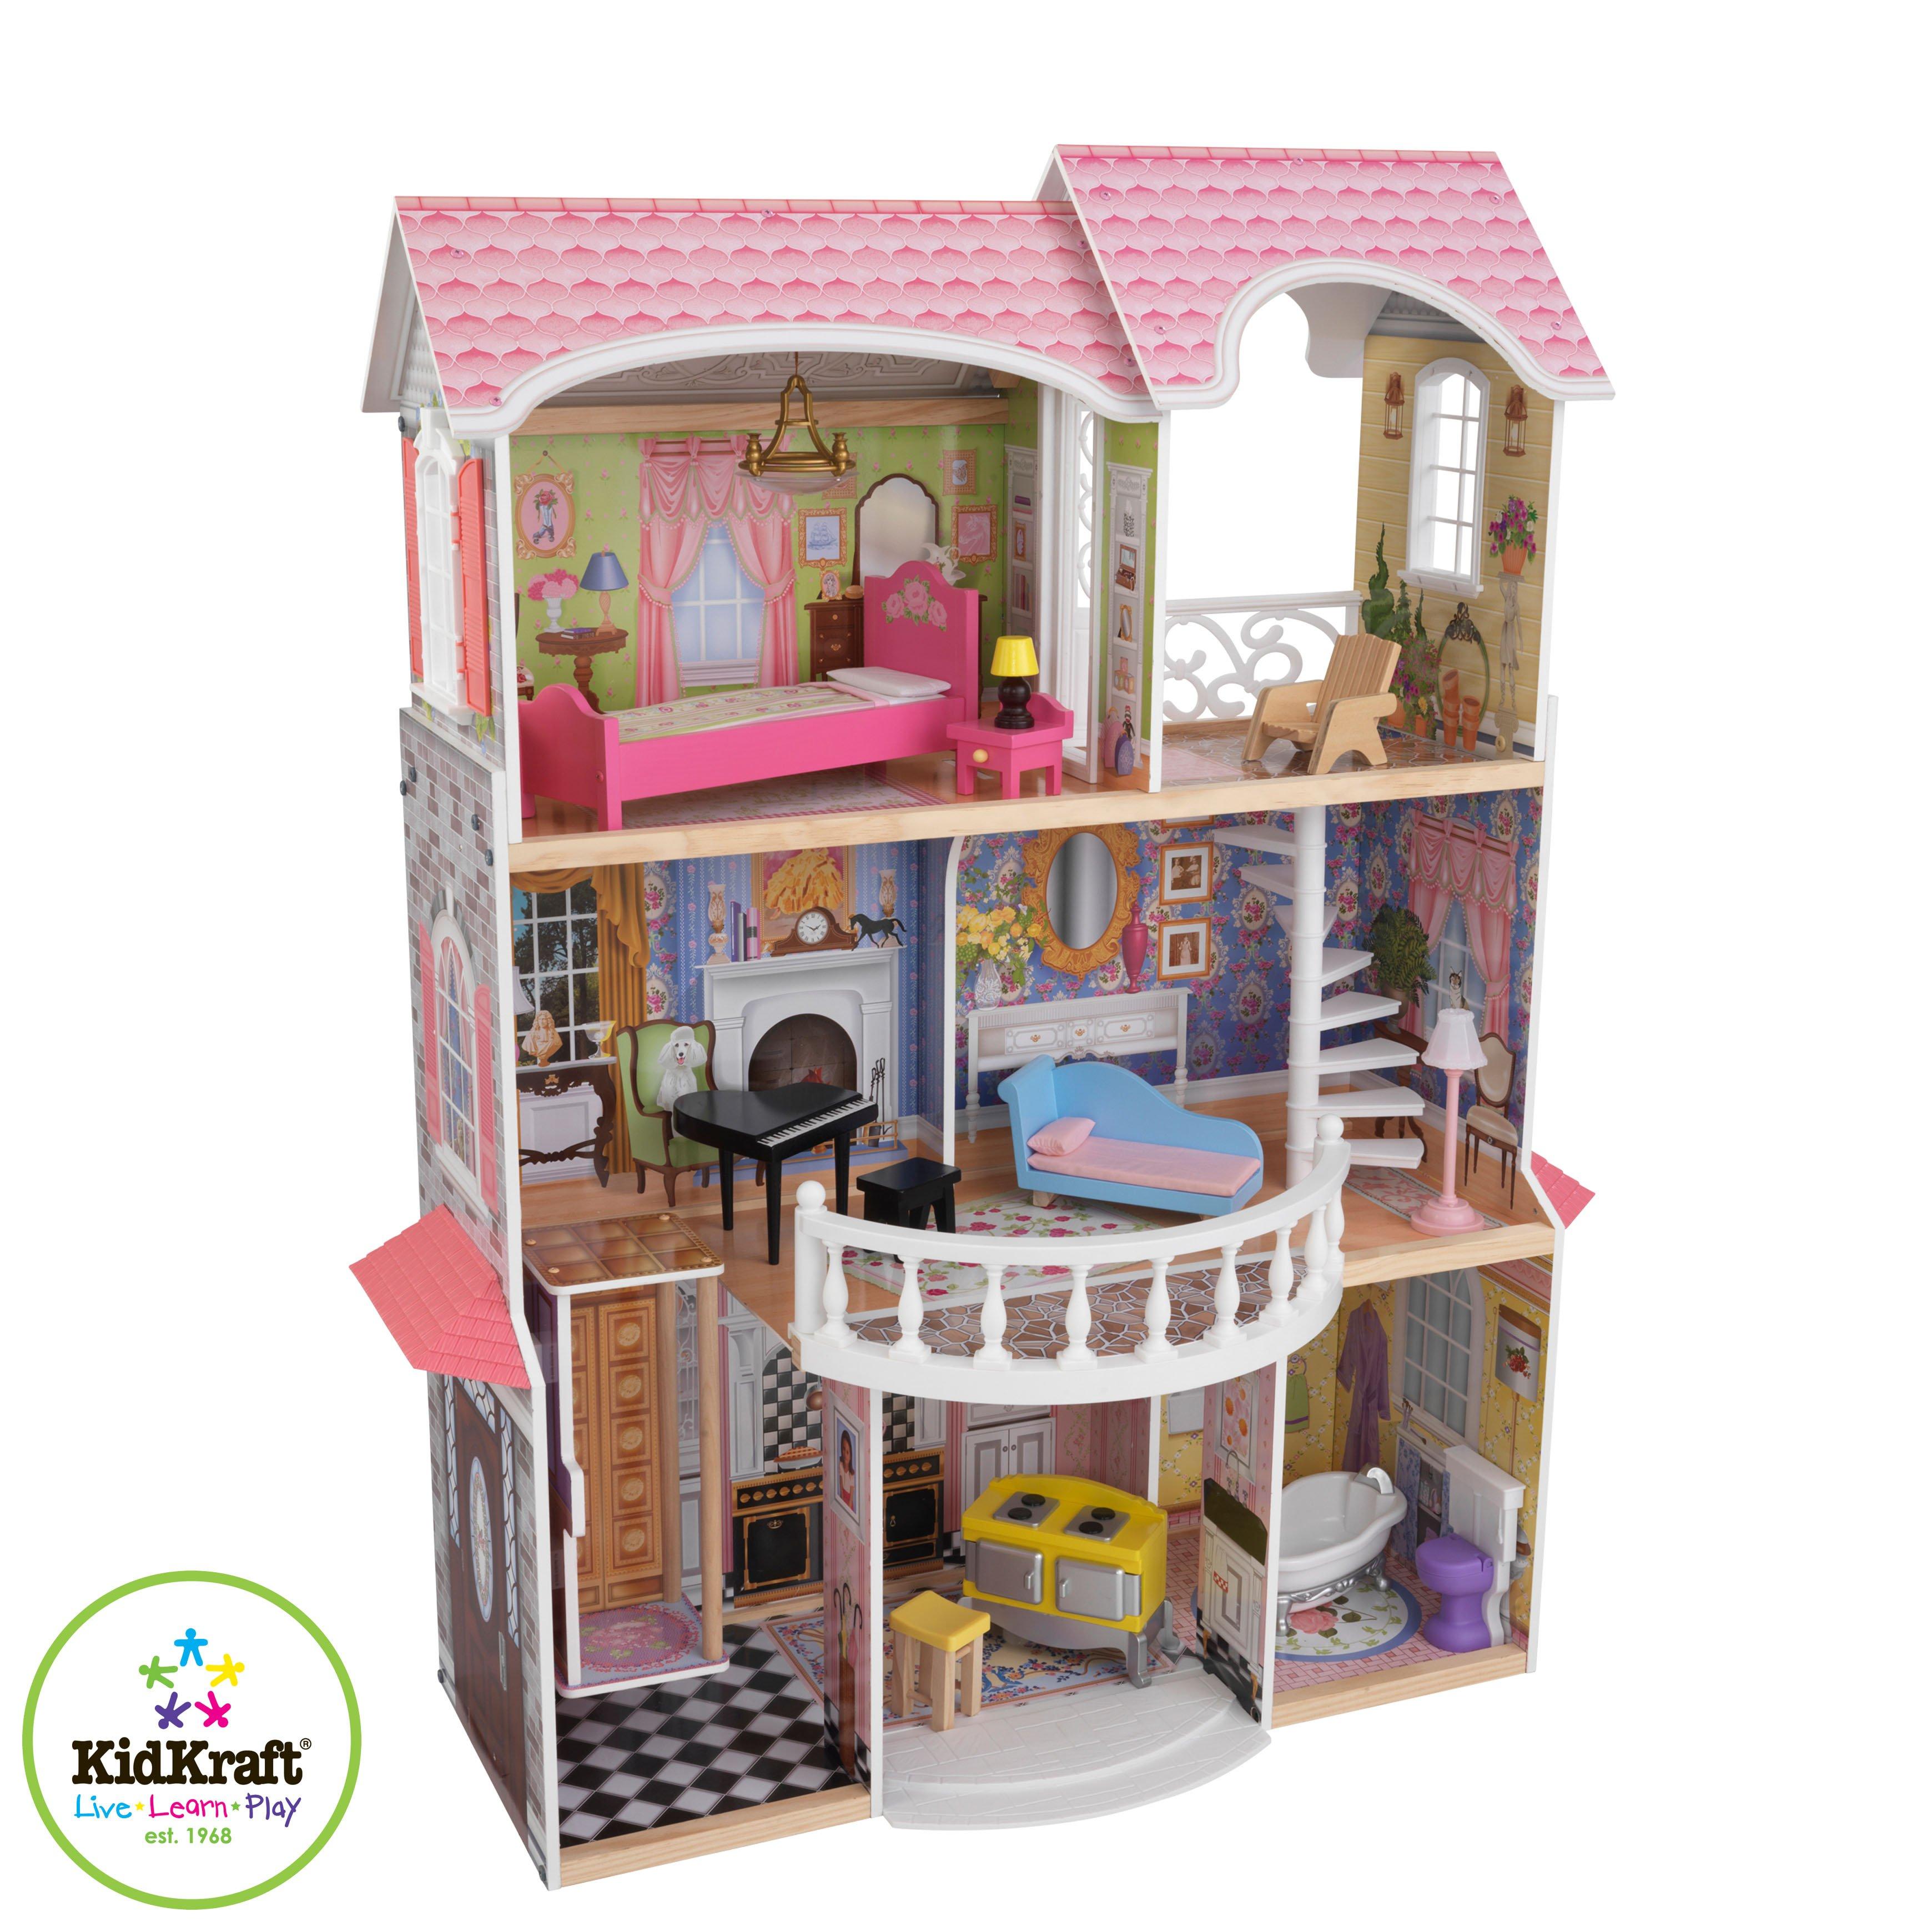 Kidkraft Magnolia Mansion Doll's House